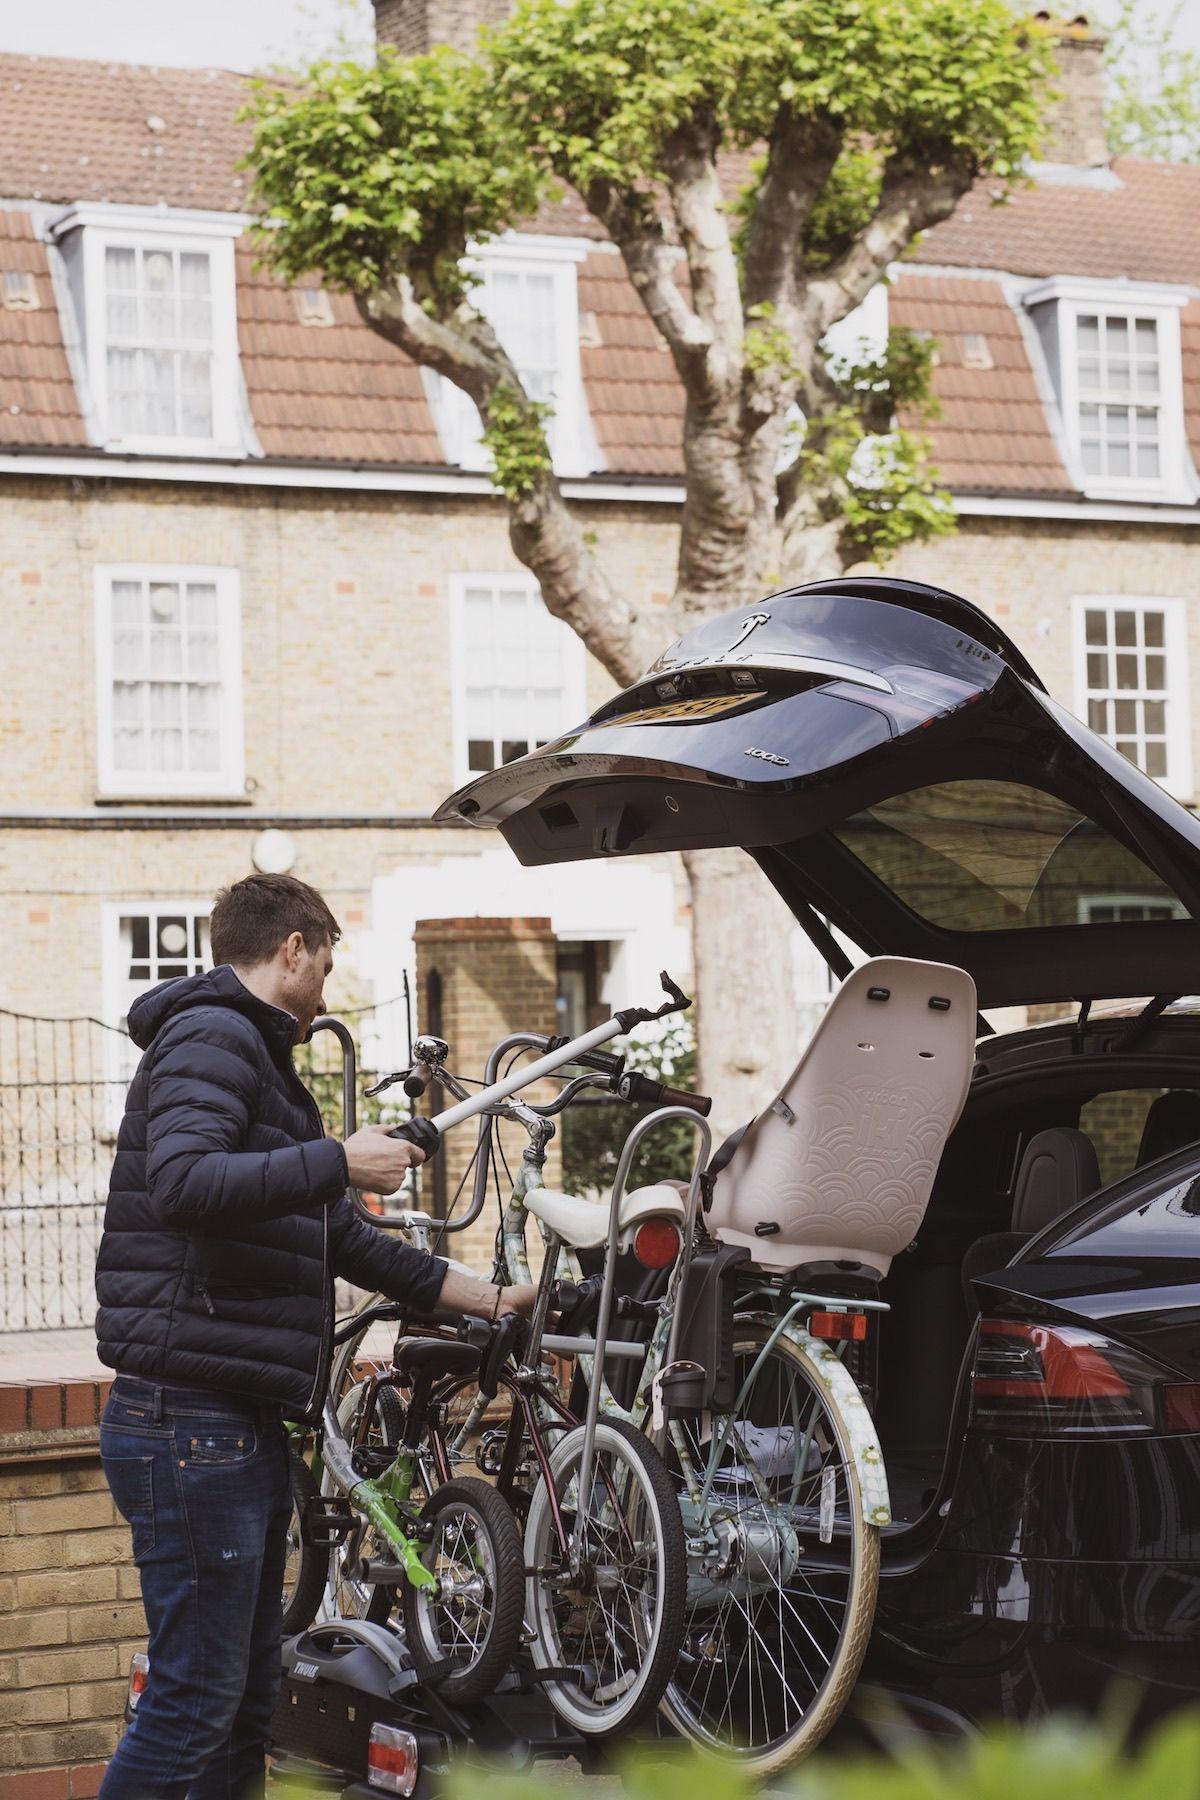 Thule did it again - THE dream bike rack for families